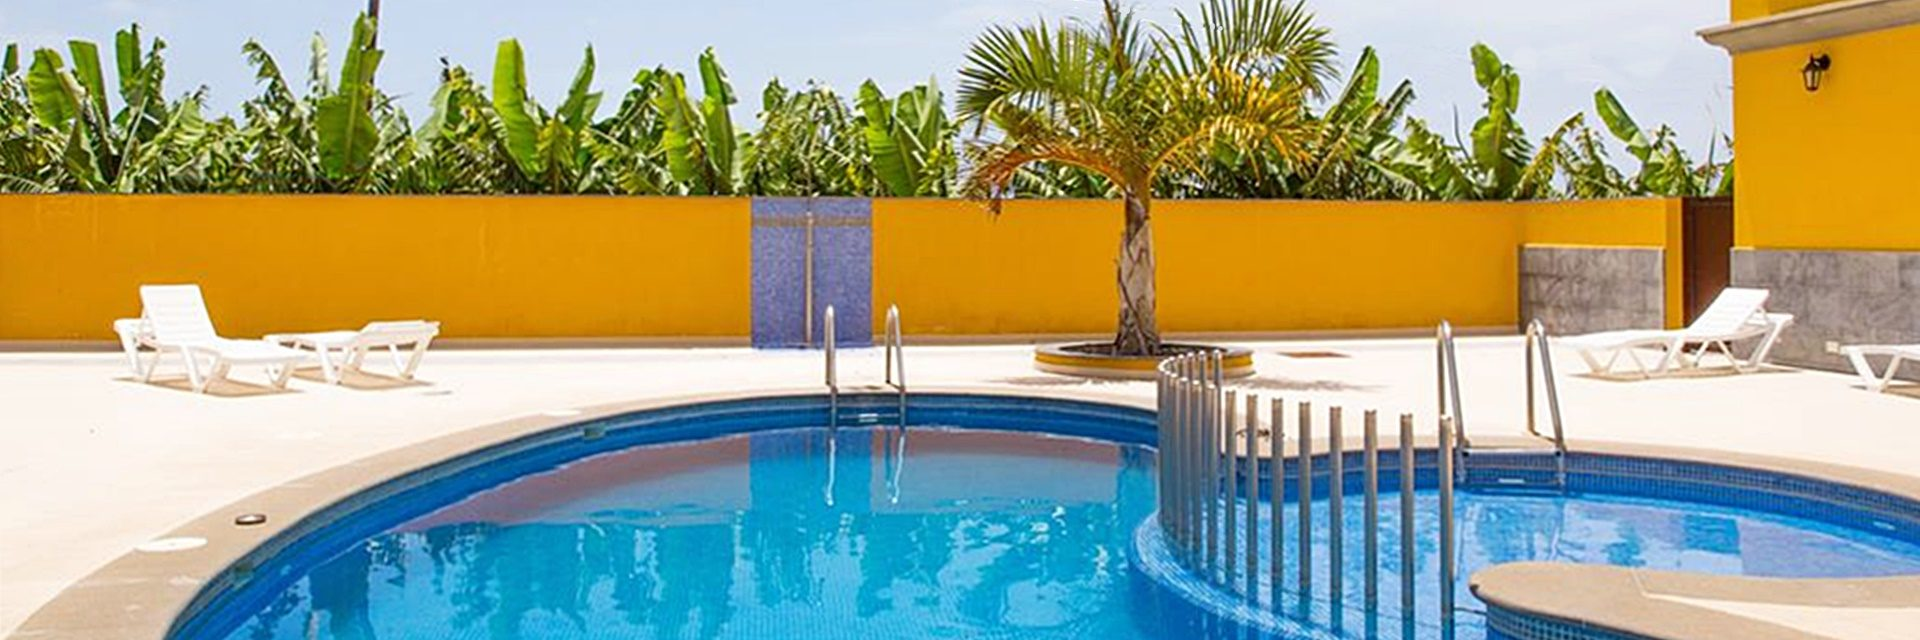 Ferienwohnung Belair - Tazacorte - La Palma